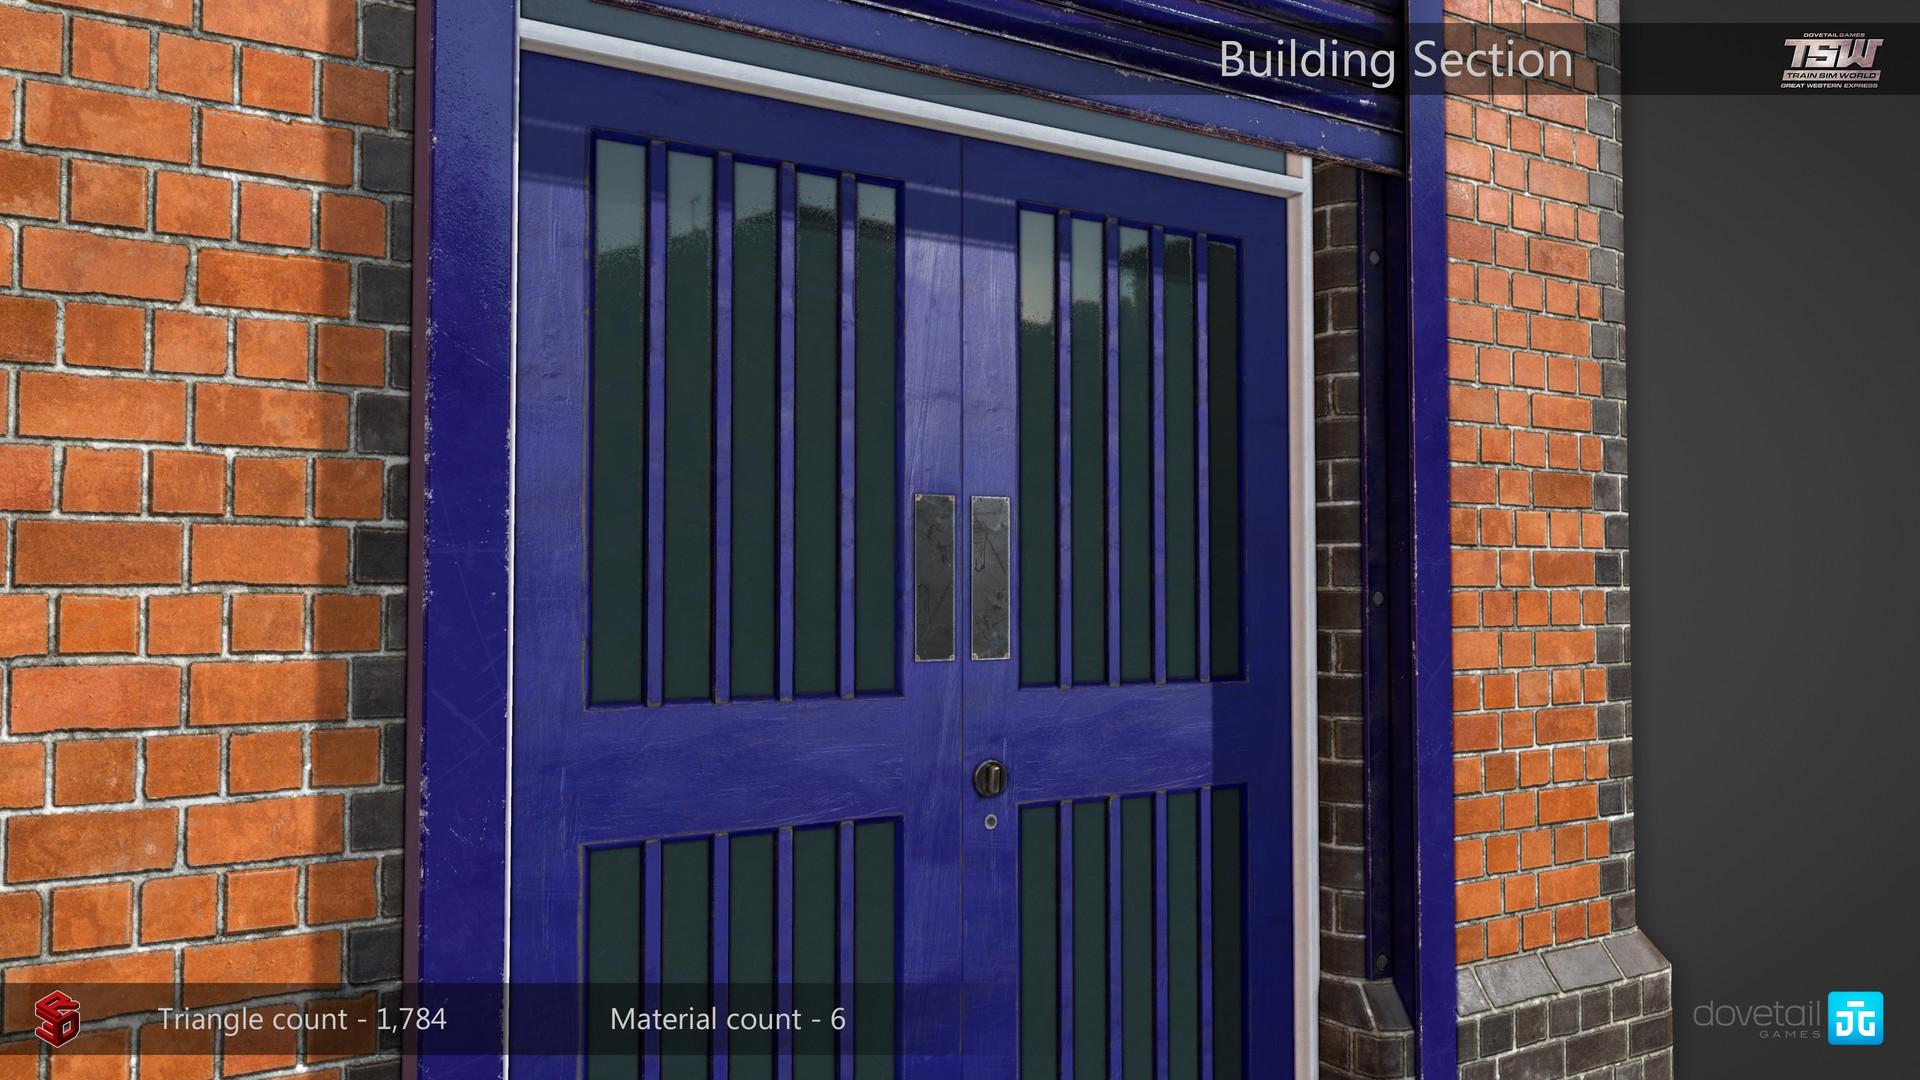 Ross mccafferty buildingsection 04